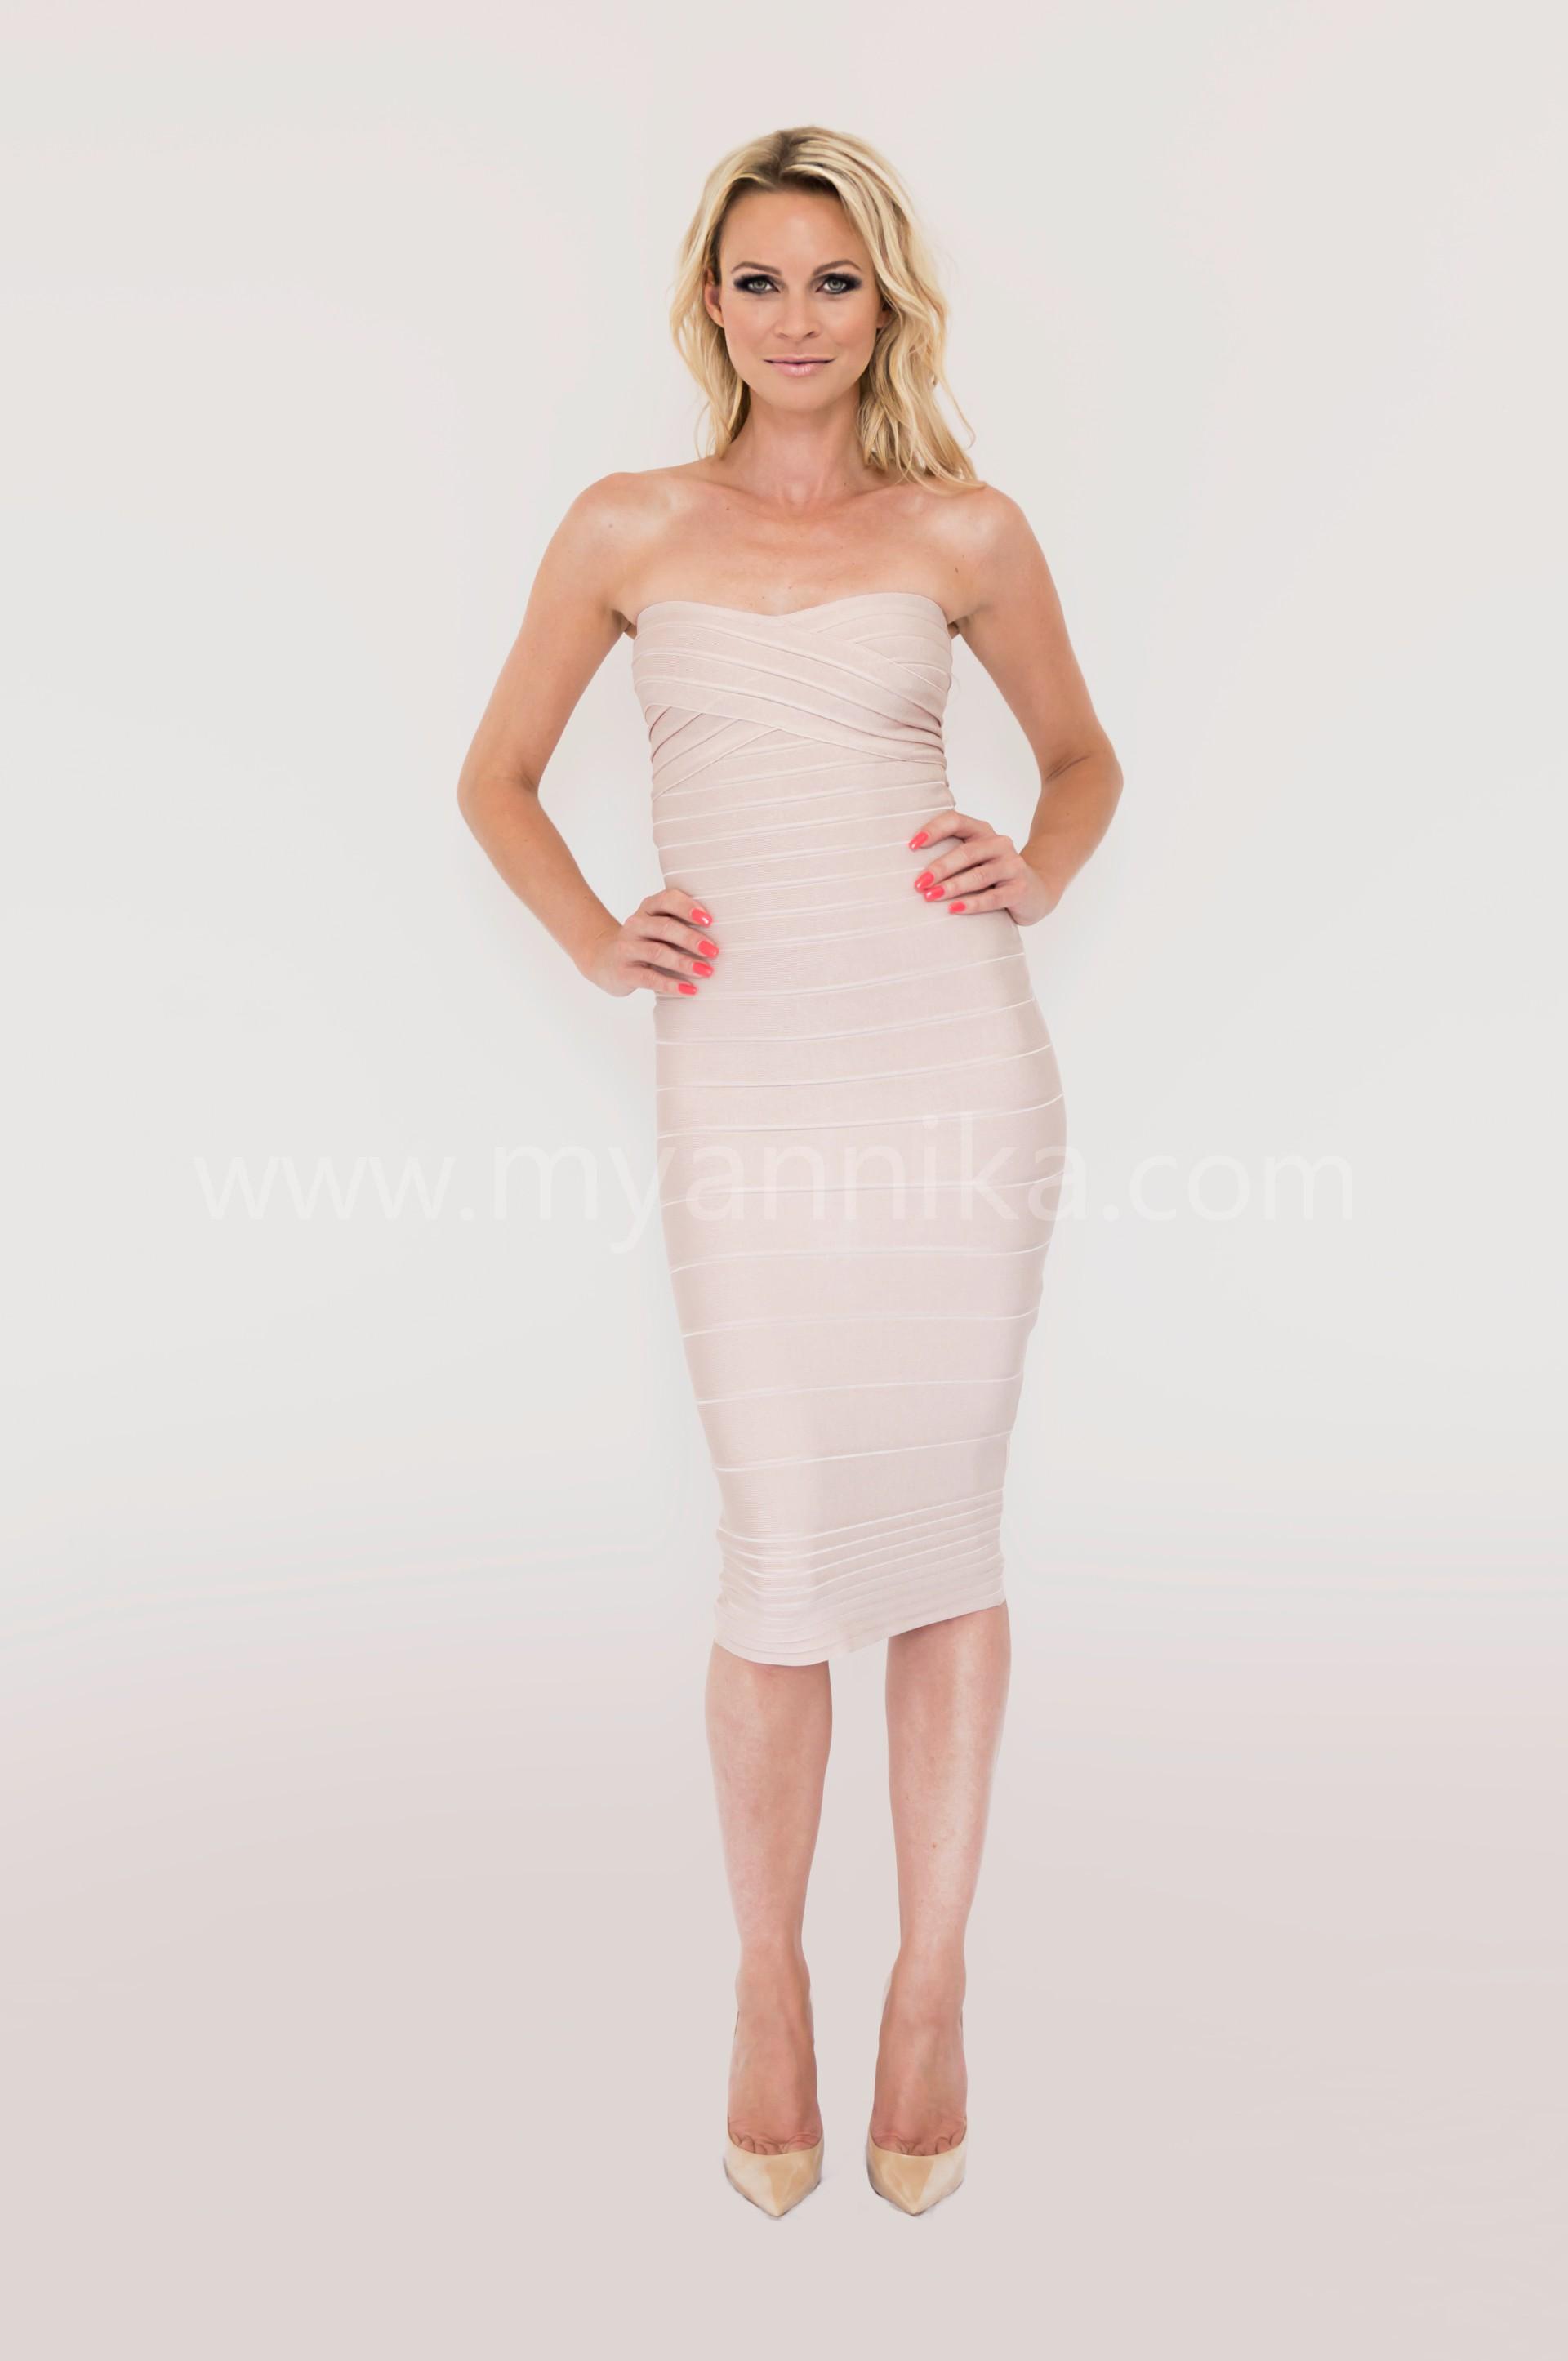 Paris long - Nude Over the Knee Strapless Bandage Dress Annika - Bandage Dresses | Celebrity Party Dresses | Herve Leger Dresses Dress detail